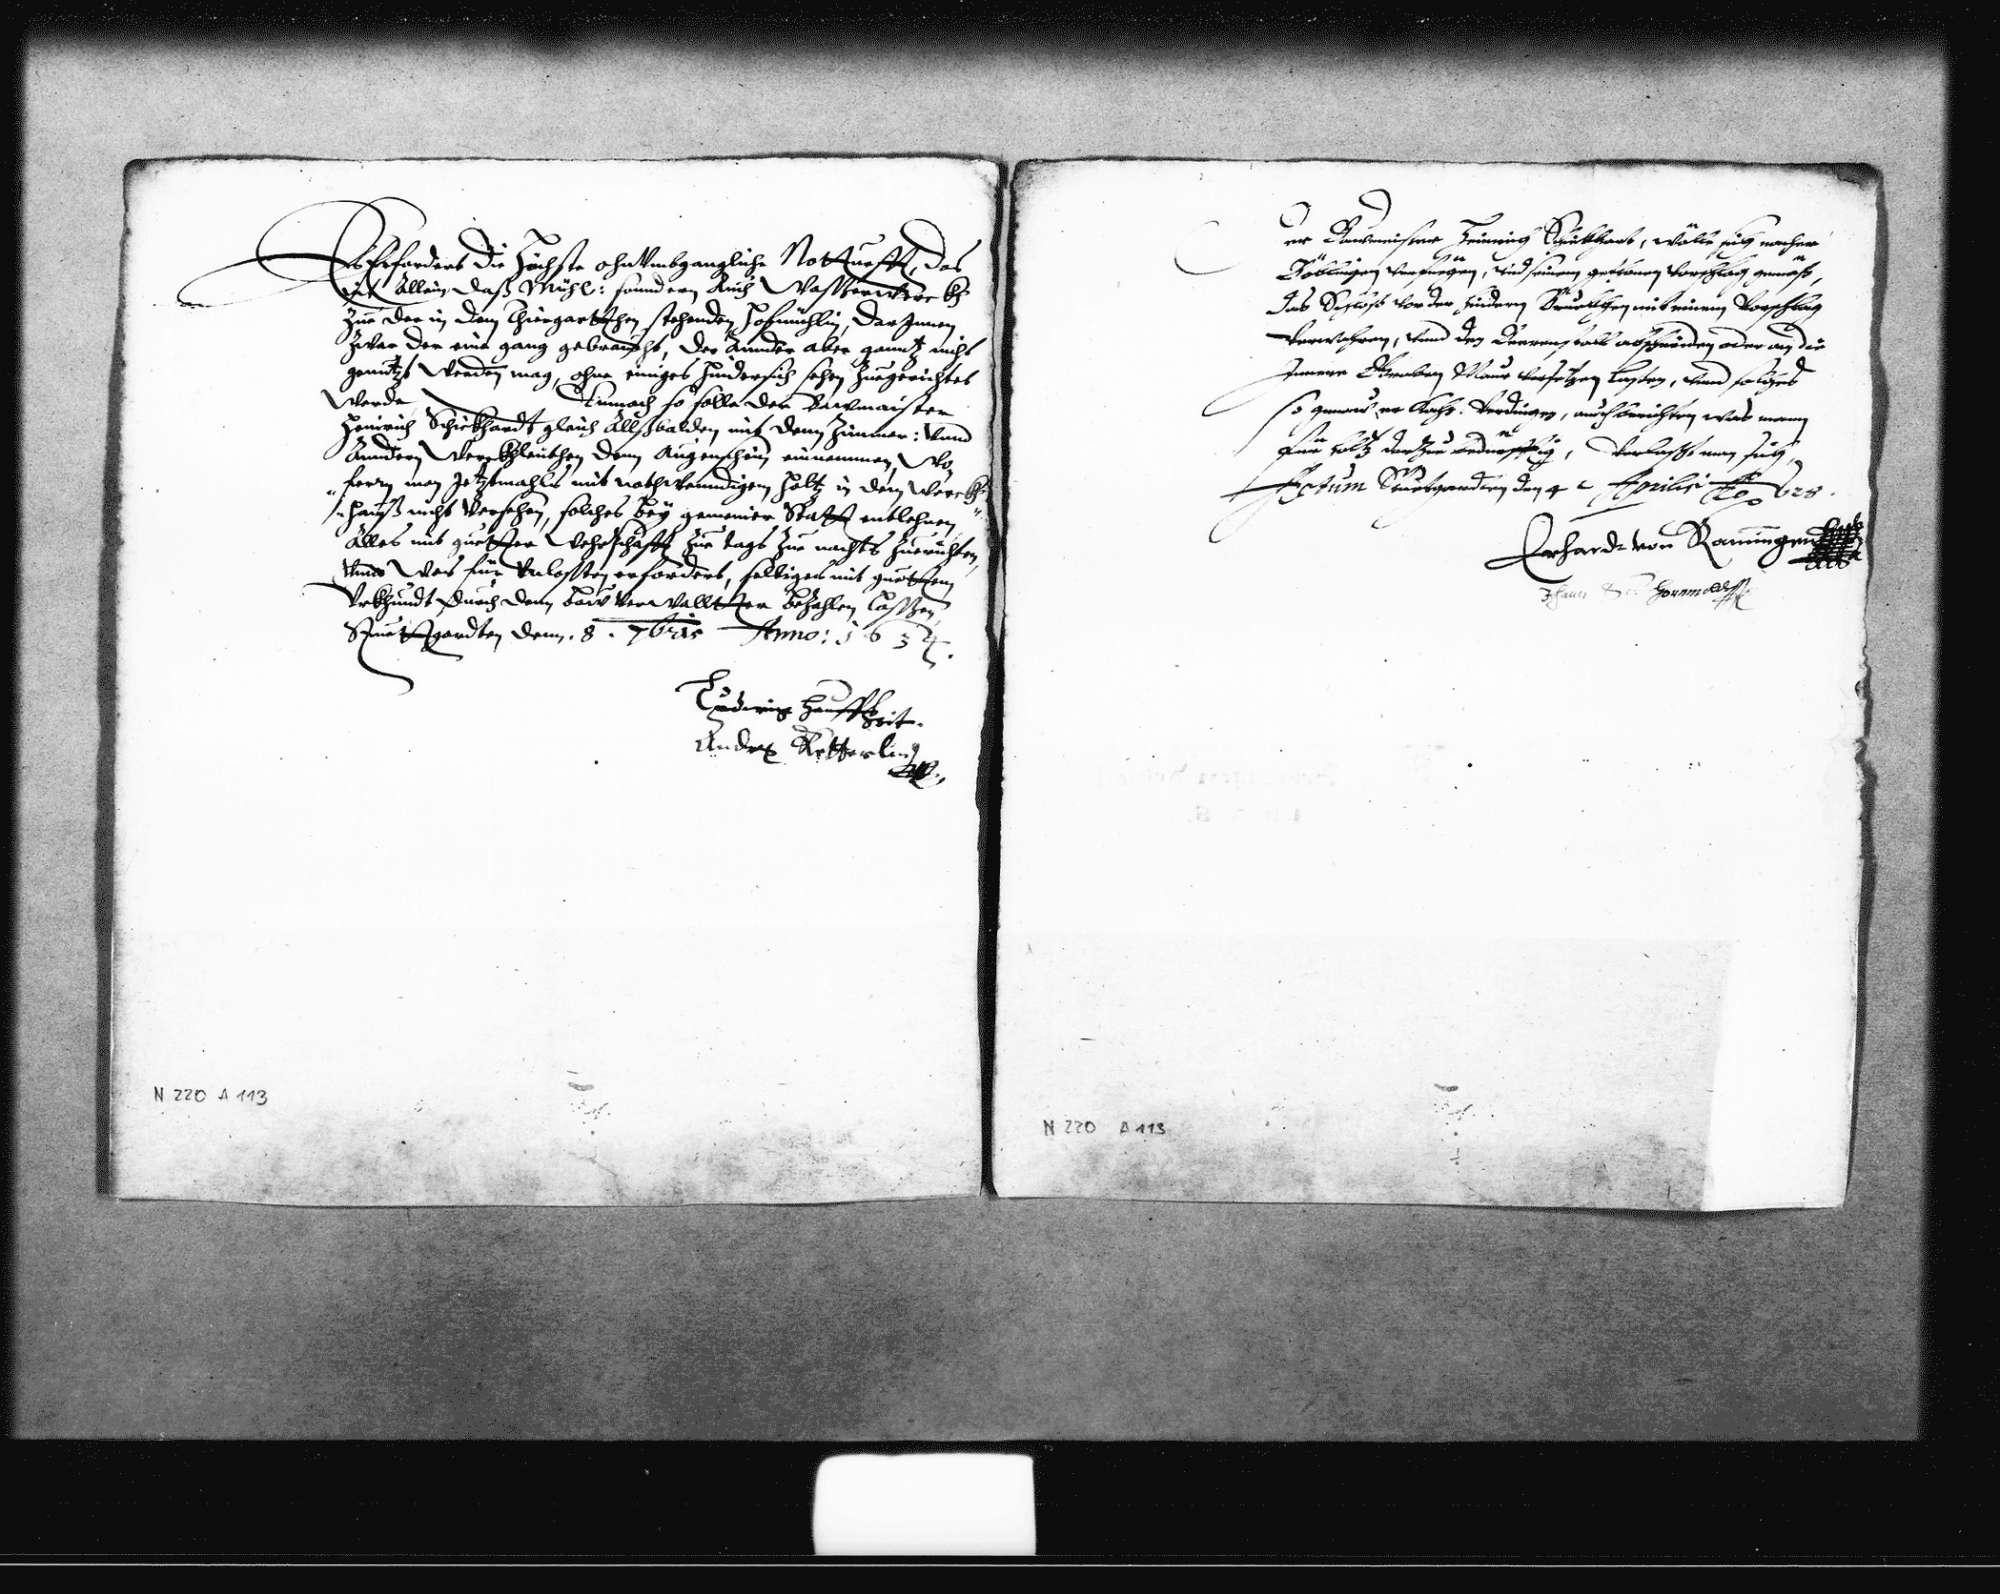 Reskripte der Rentkammer an Schickhardt, Bild 1